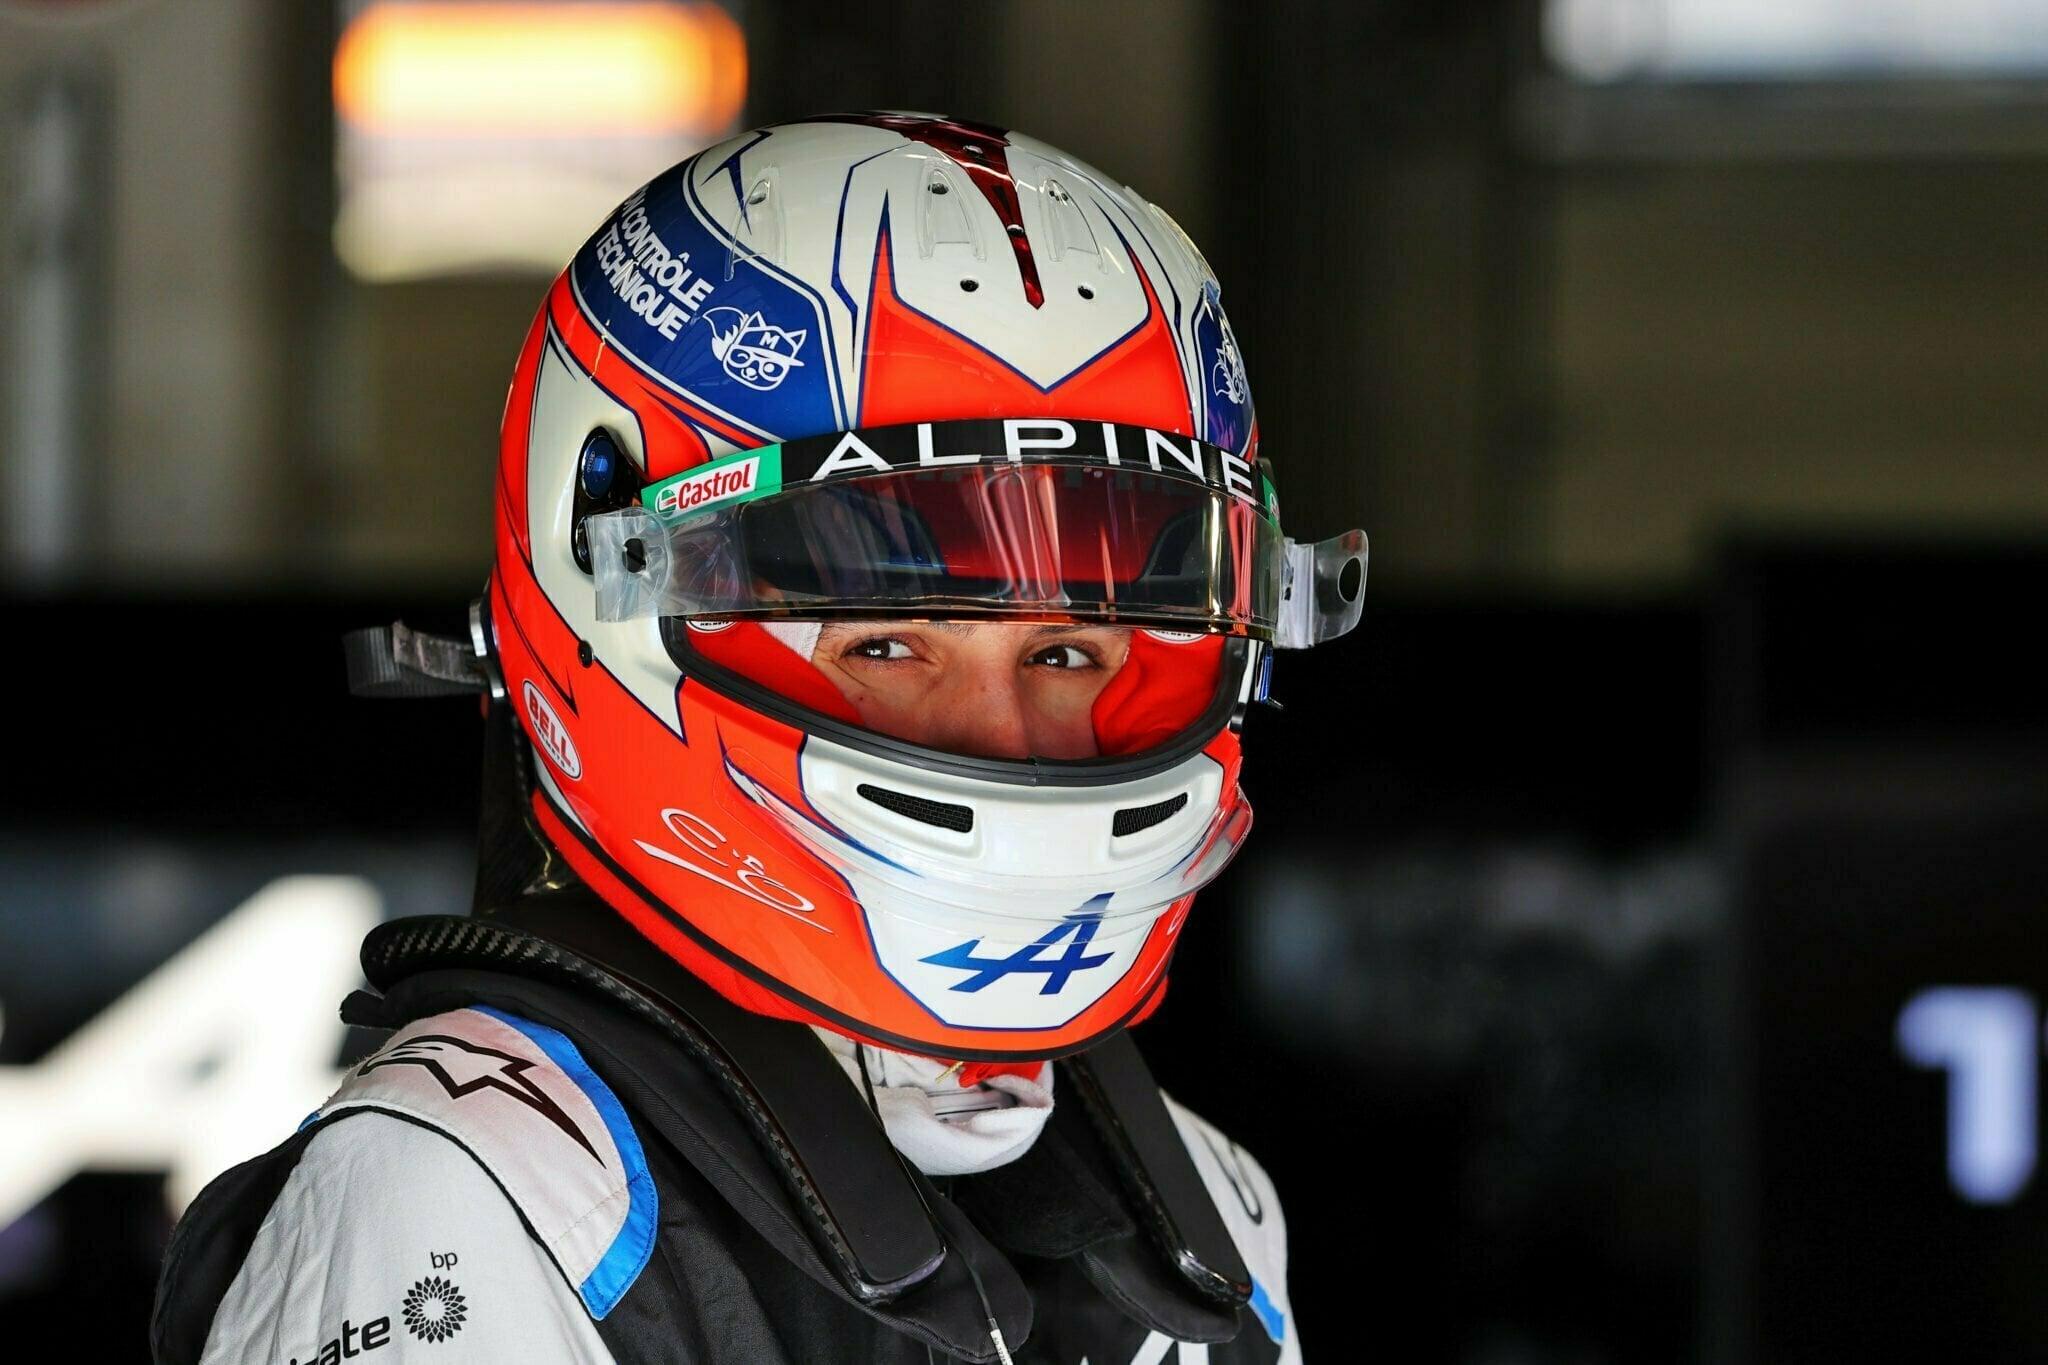 Alpine F1 Team Alonso Ocon Autriche Steiermark Grand Prix Spielberg A521 2021 15 | Alpine F1 : Alonso rapporte deux points au Grand Prix BWT de Styrie